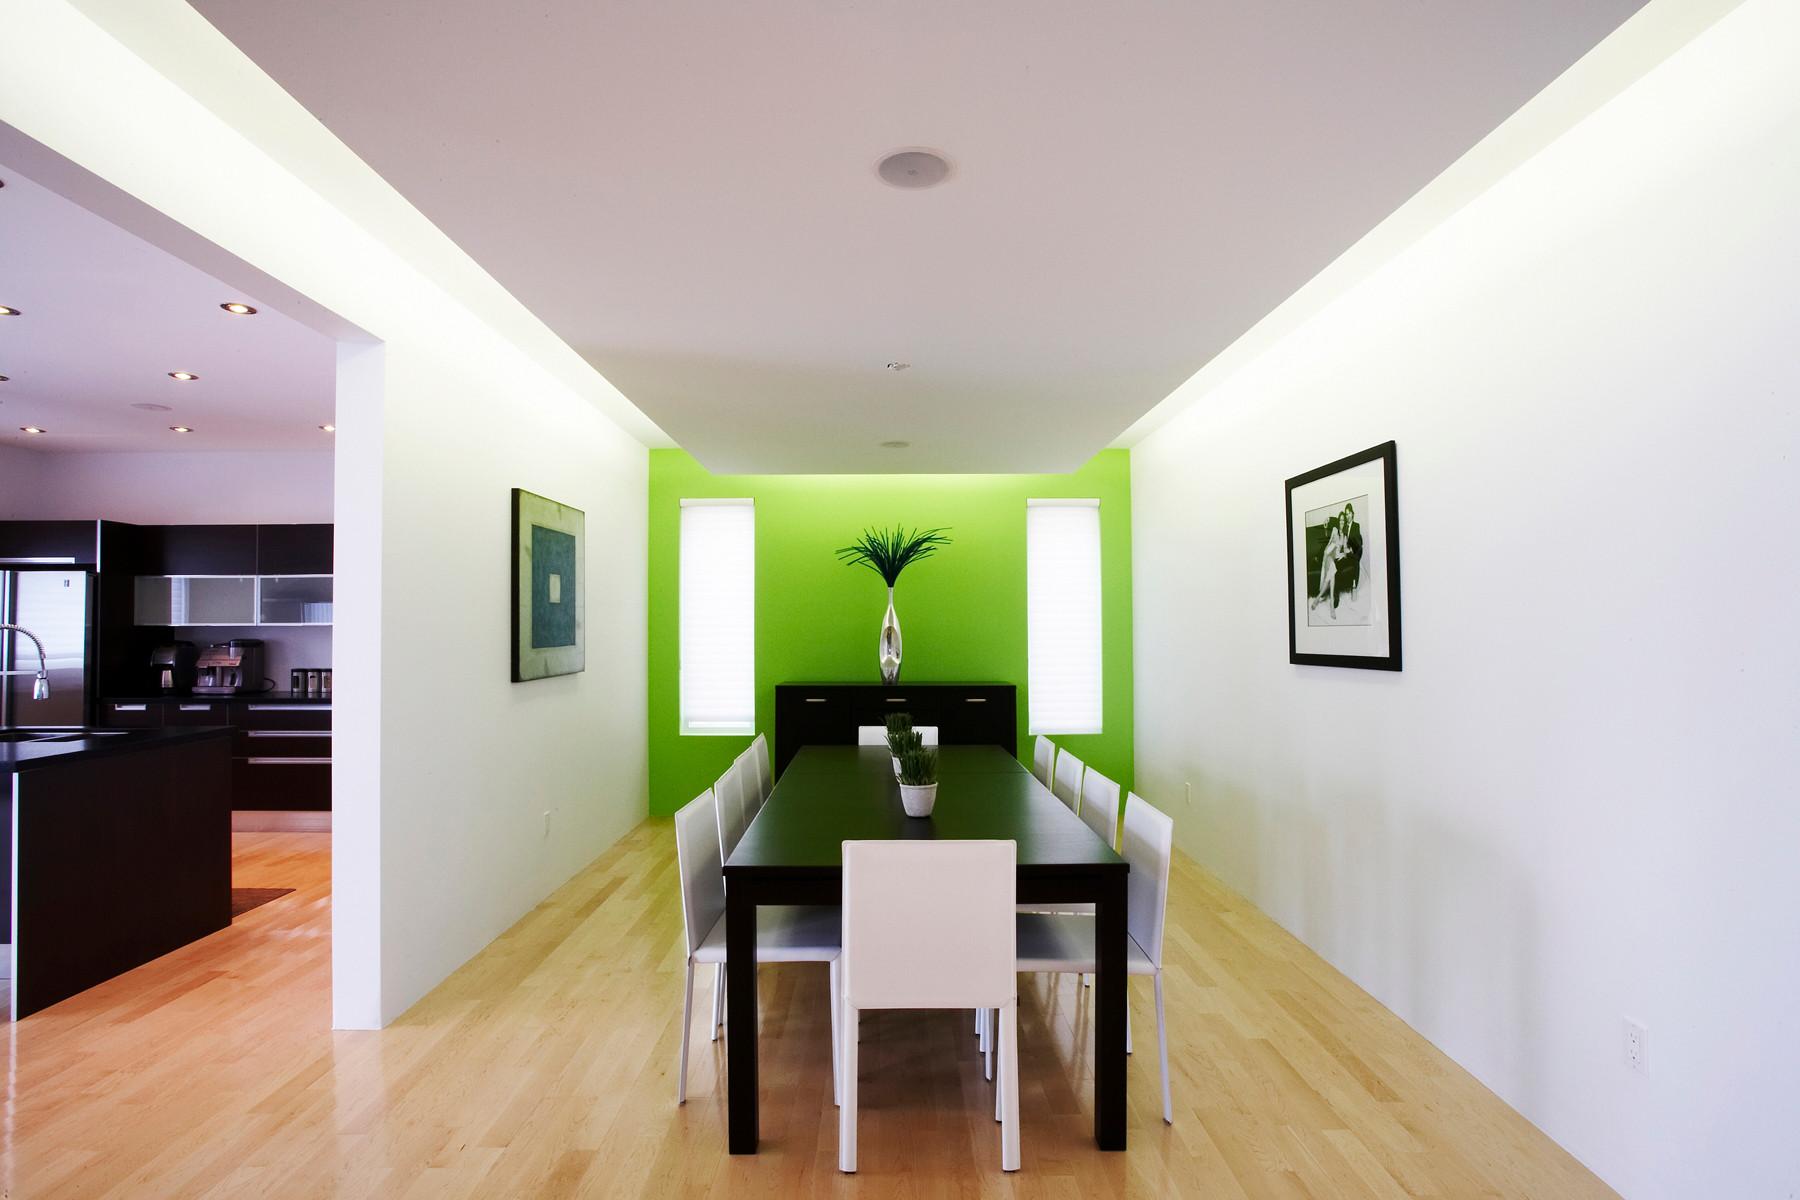 Interiors/Architecture Photography